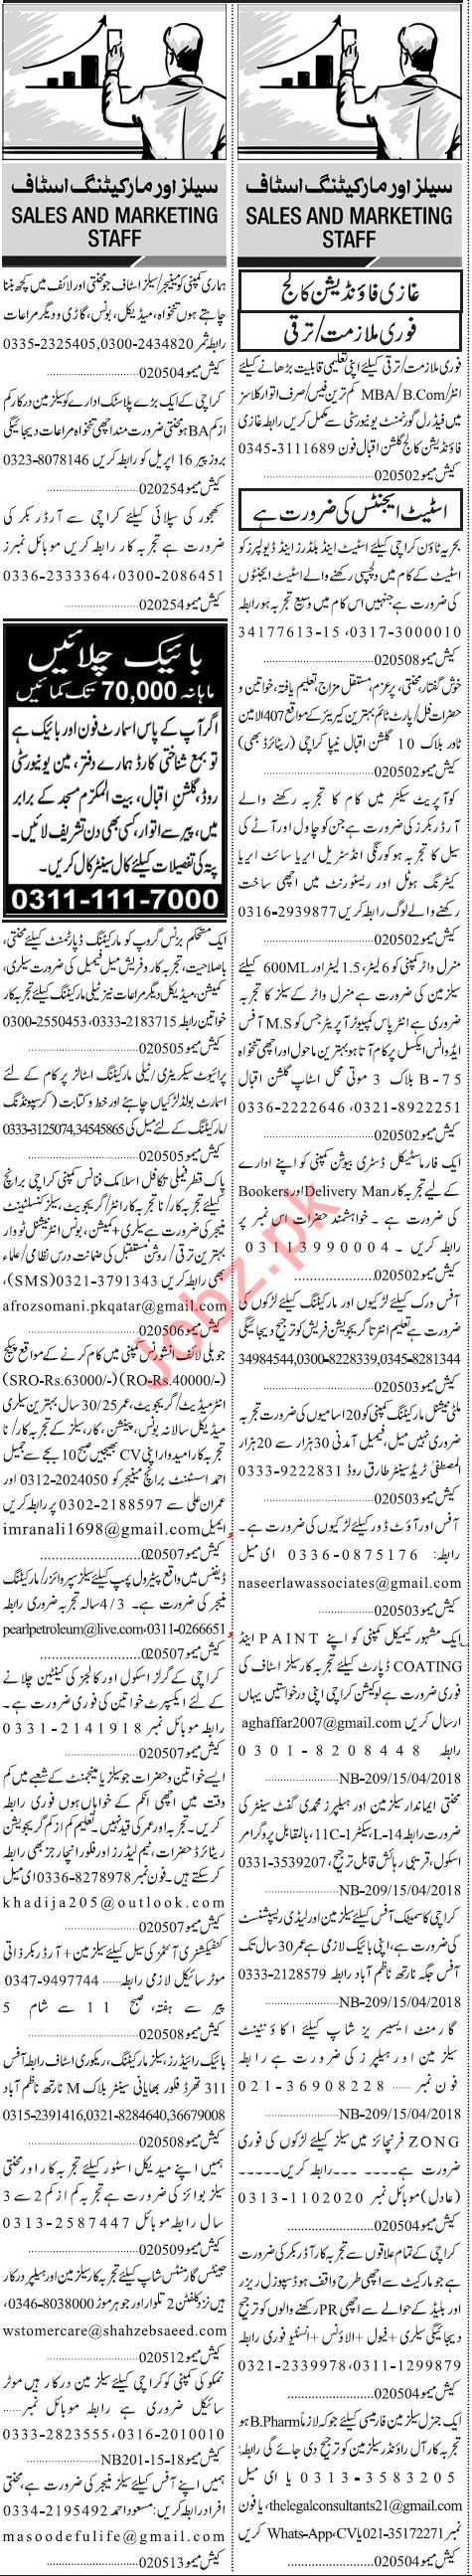 Sales & Marketing Staff Jobs Opportunity in Karachi